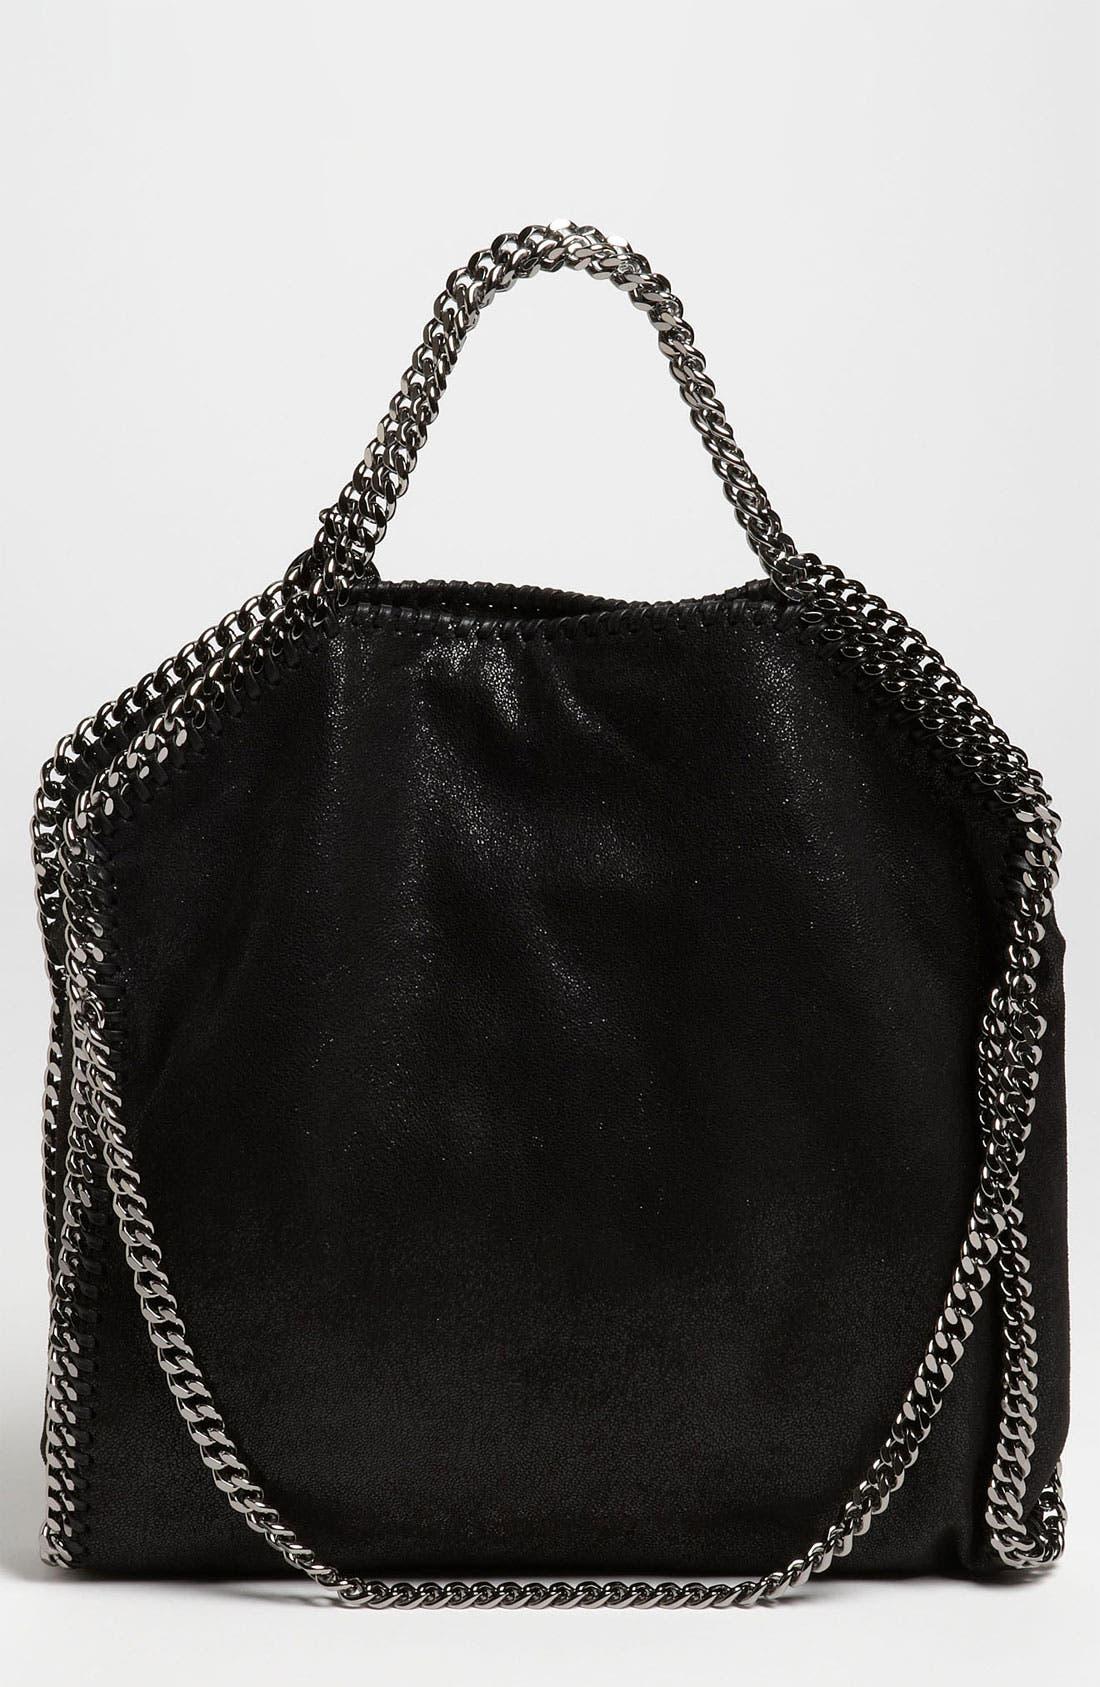 stella mccartney väska svart